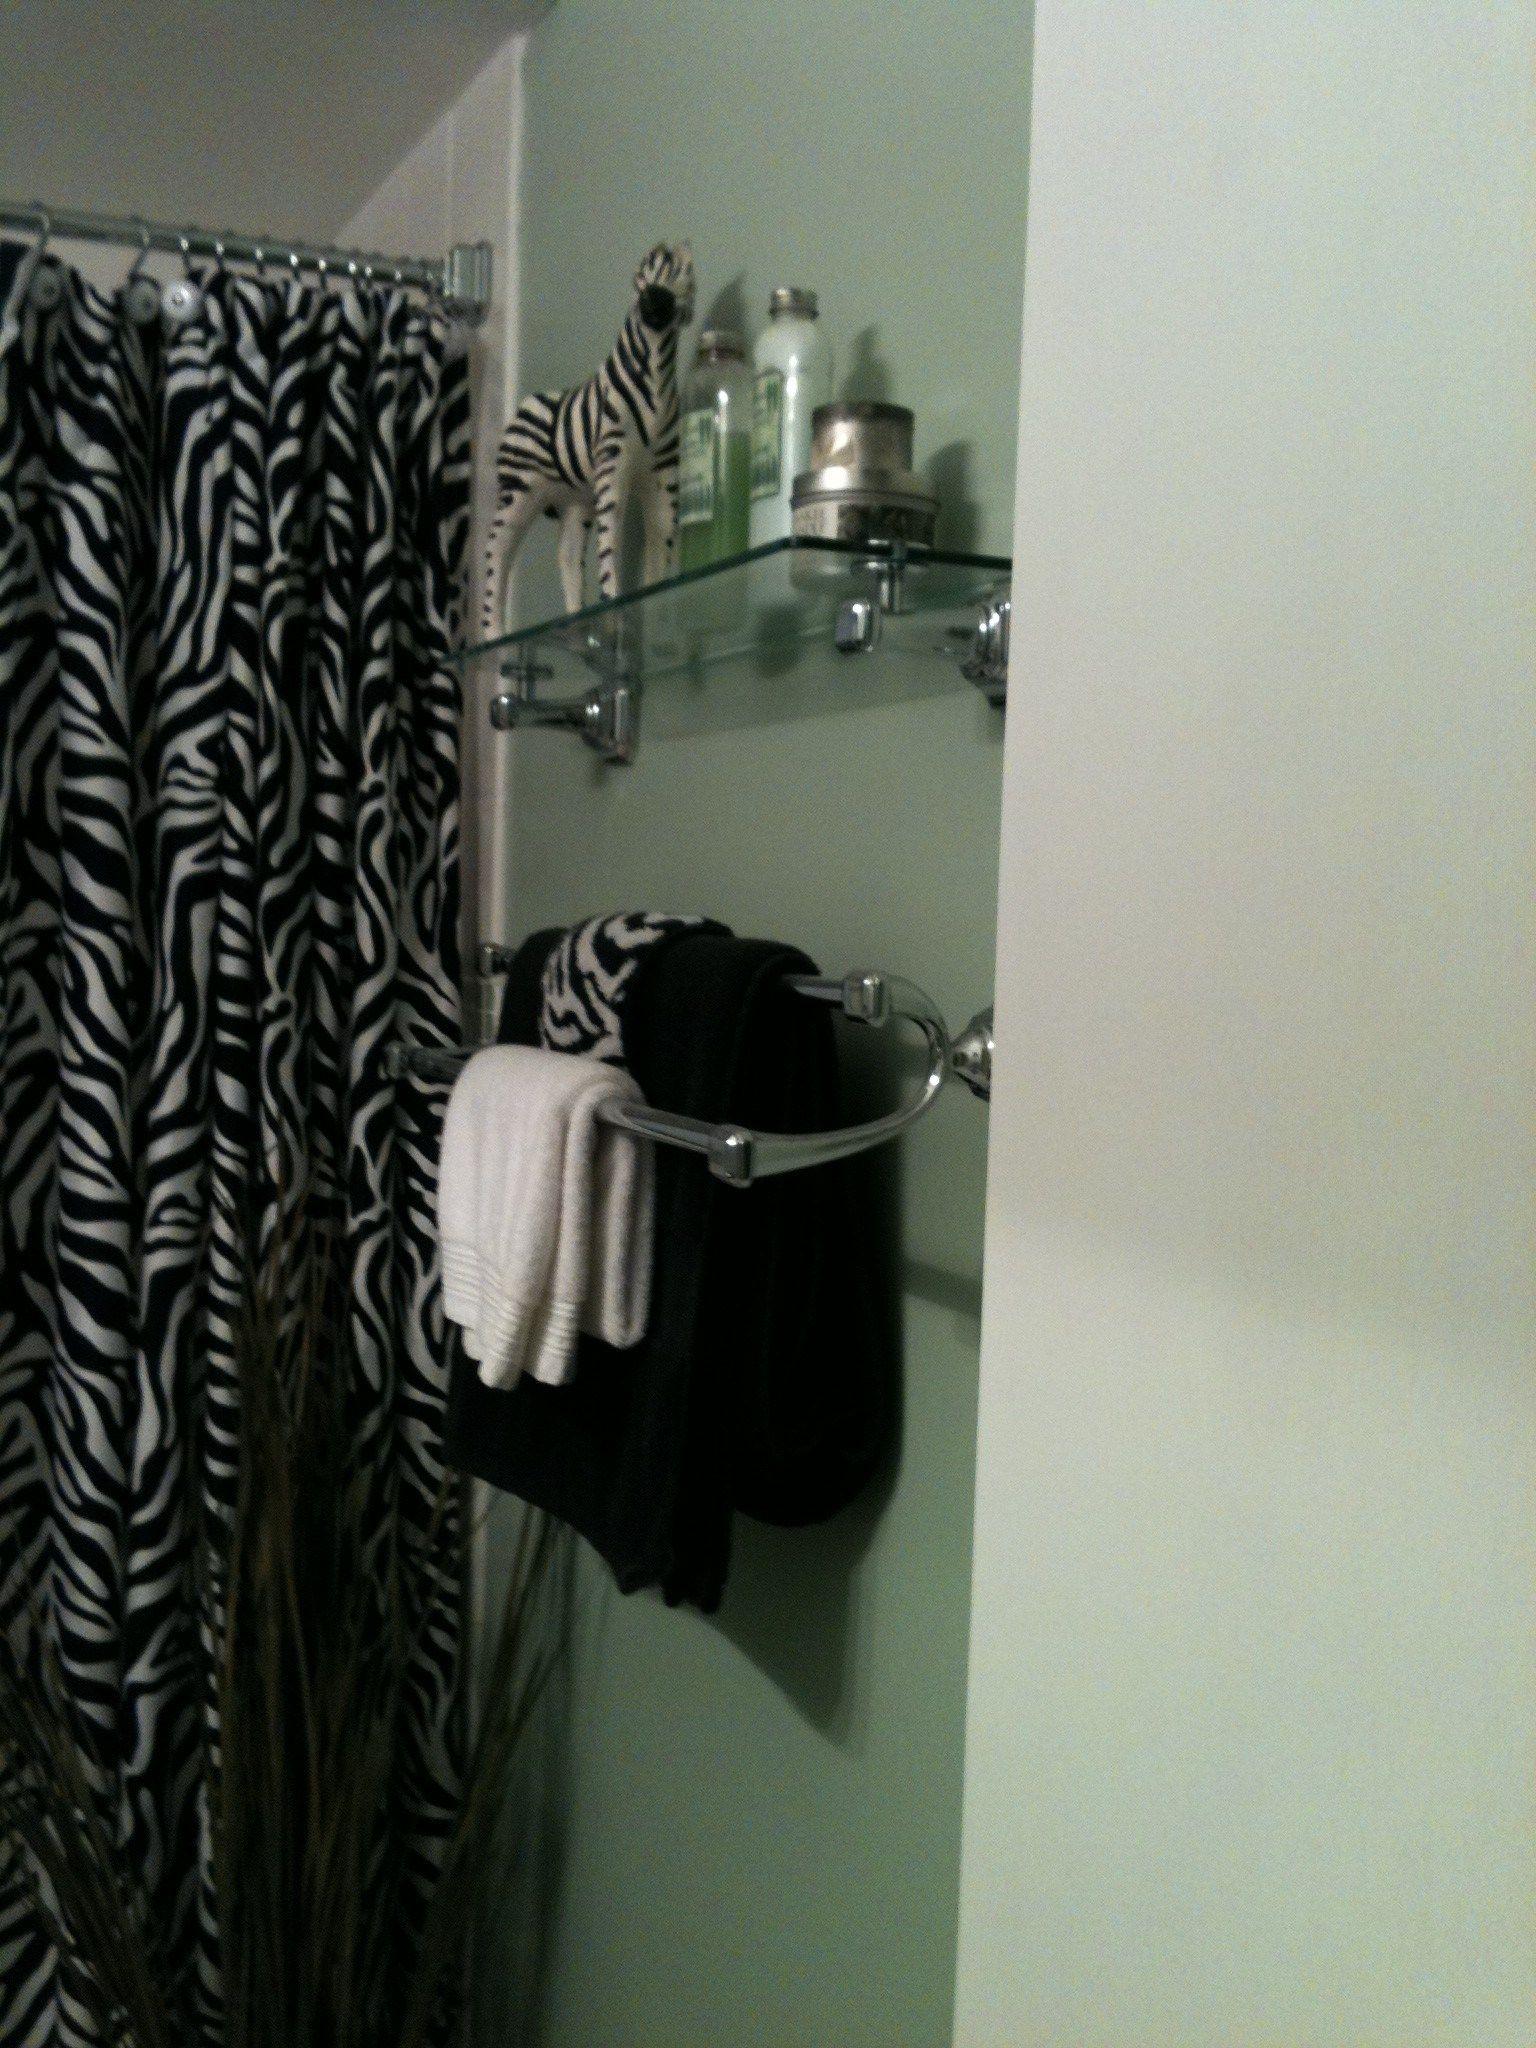 Best Furniture Ideas Ever Beautiful Bathroom Decor Beautiful Bathrooms Bathroom Decor Pink zebra bathroom decor